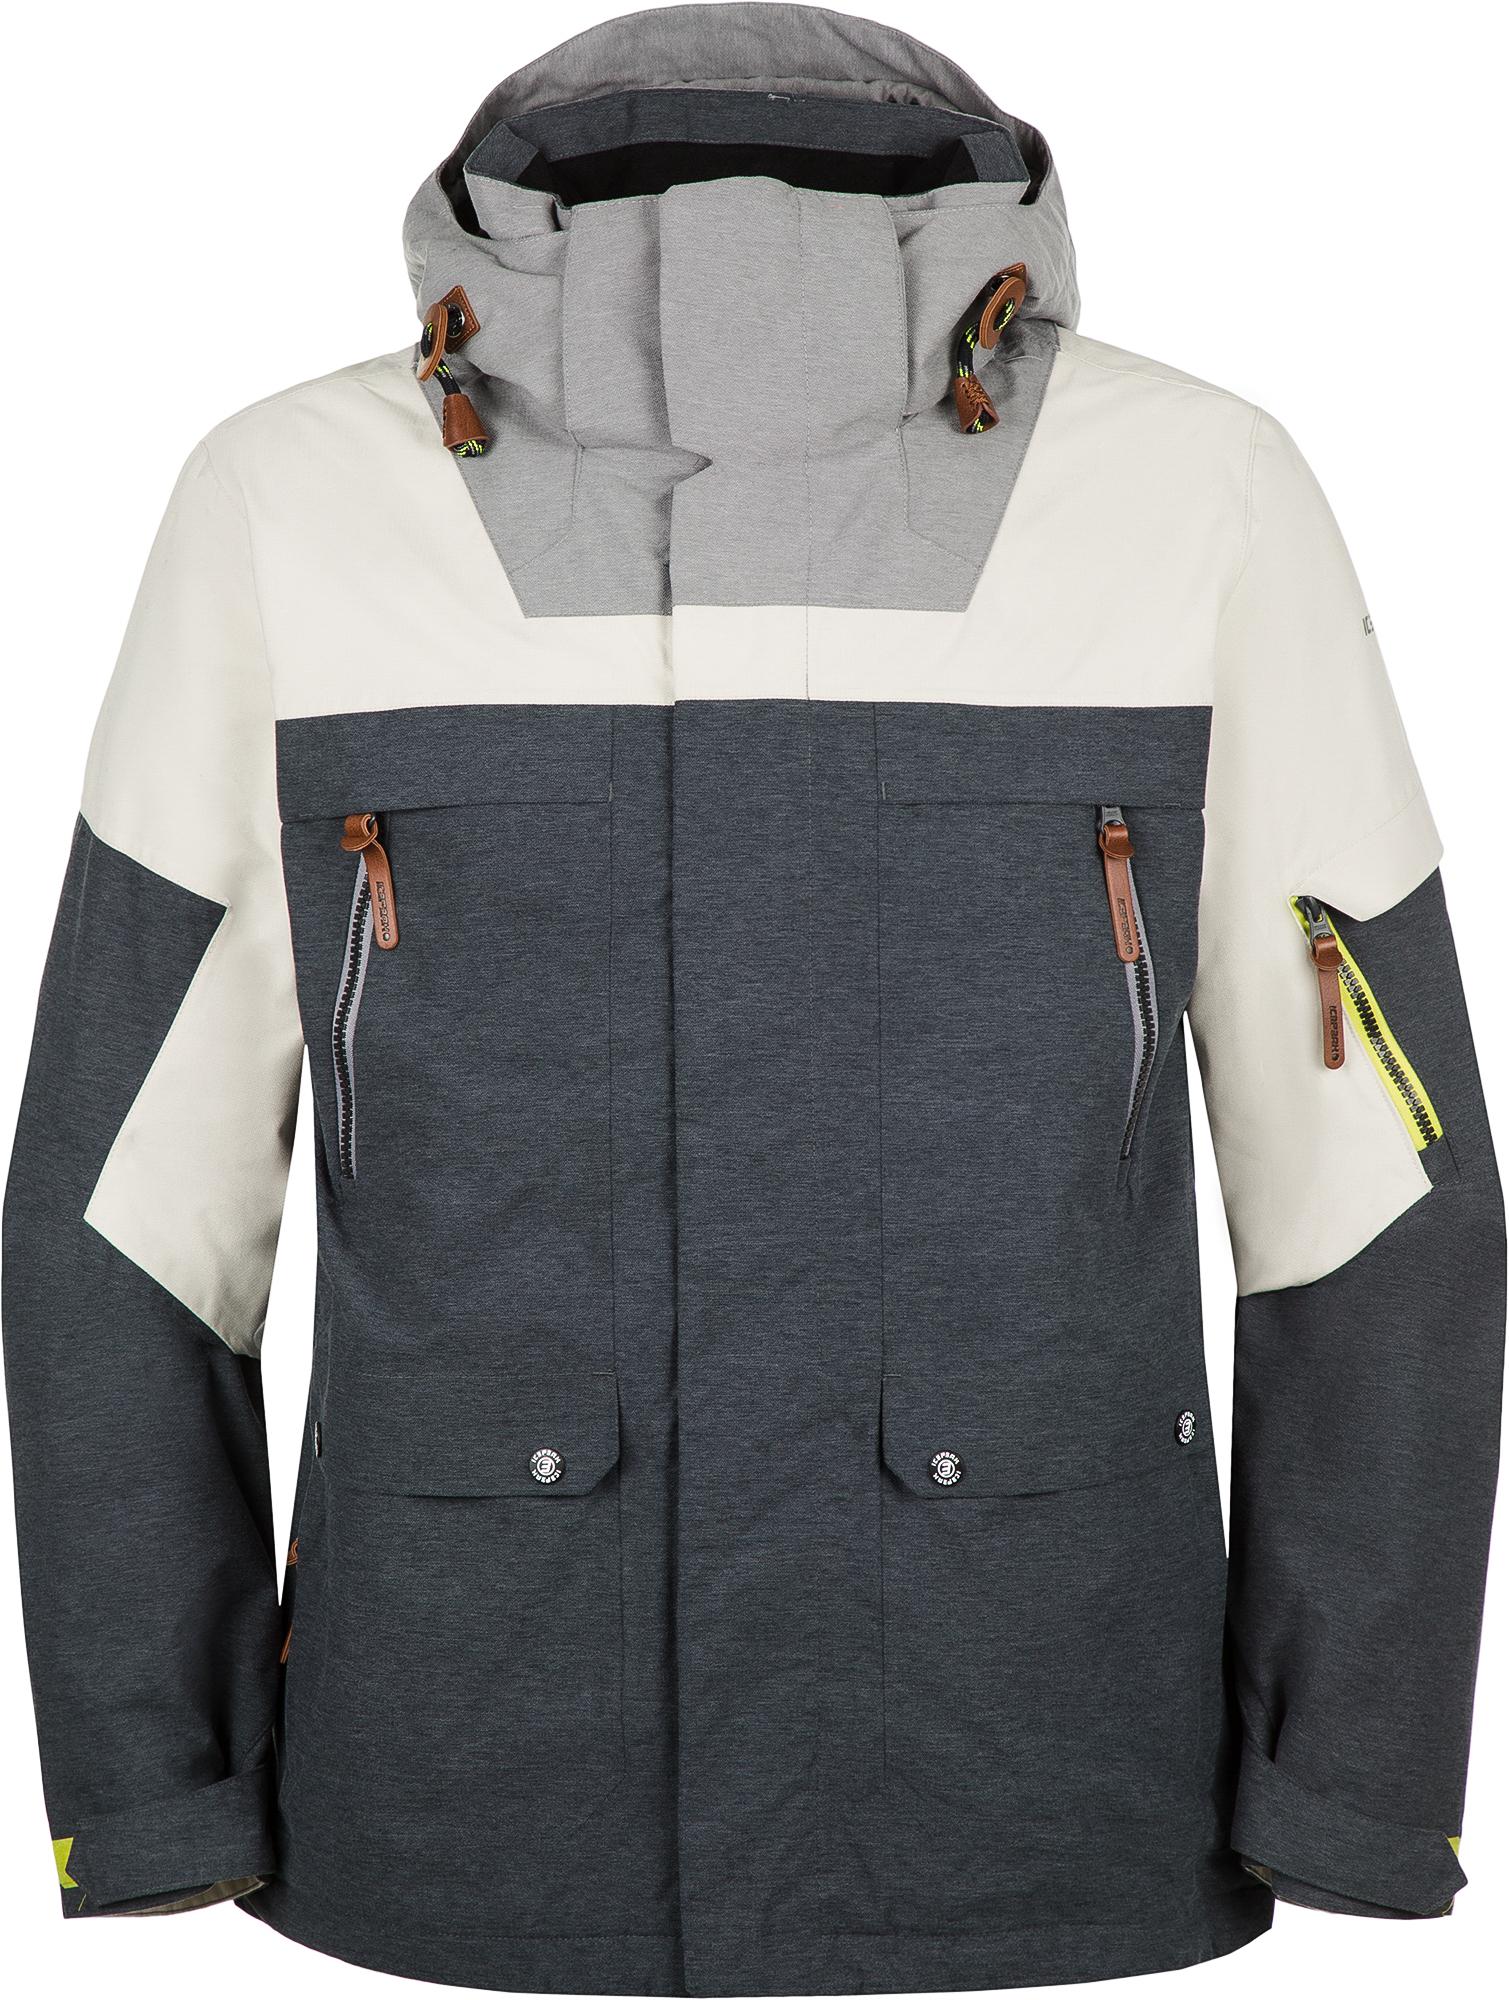 цена IcePeak Куртка мужская IcePeak Clarkson, размер 54 онлайн в 2017 году